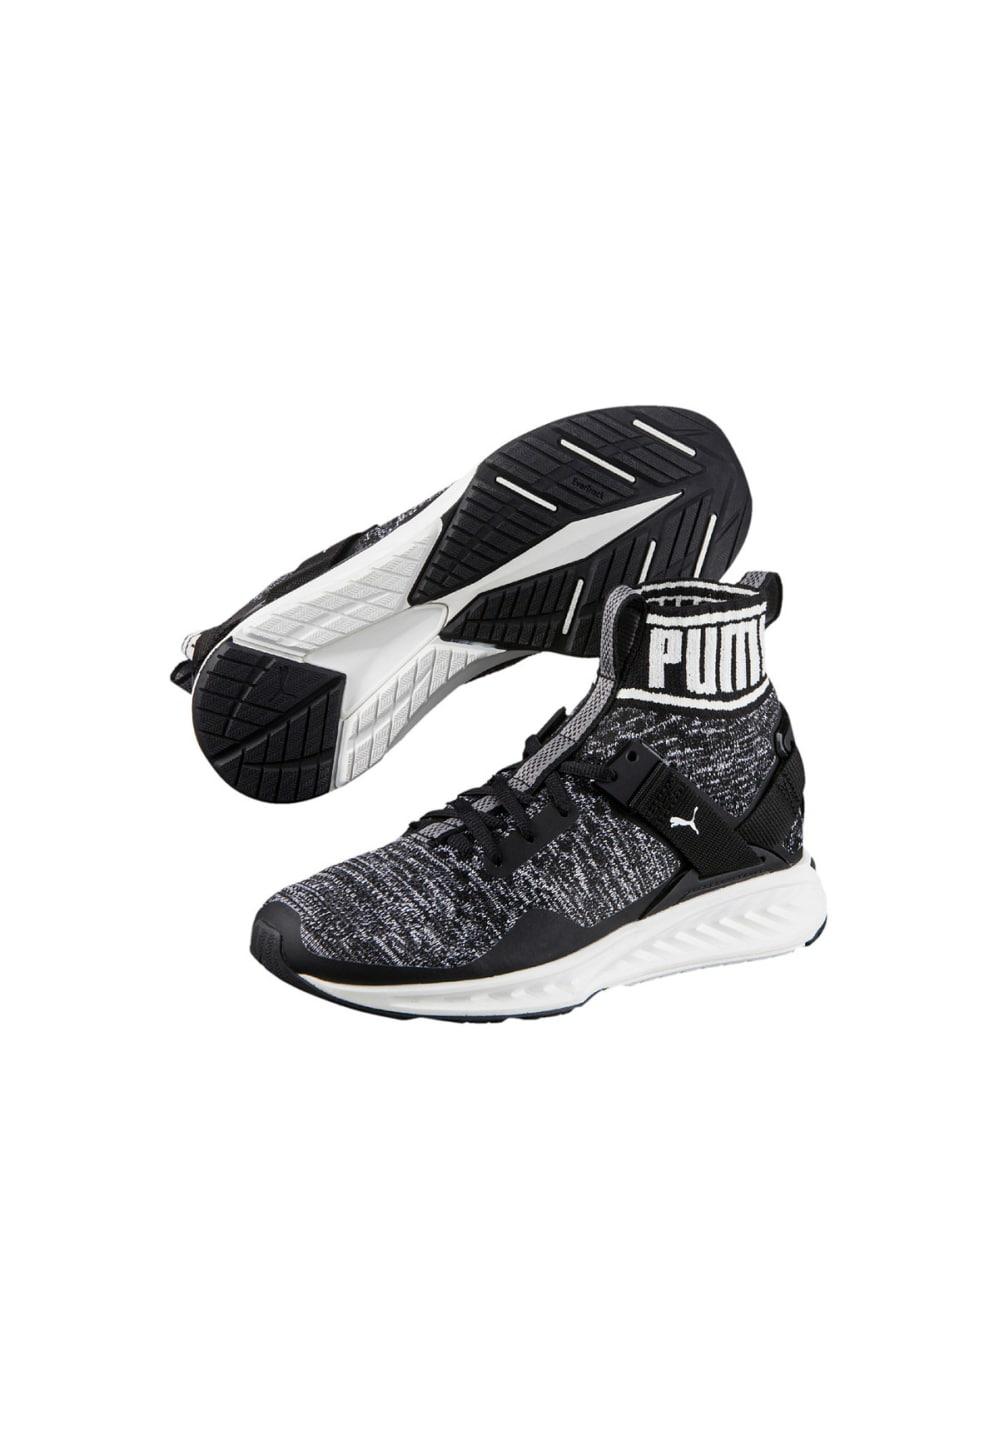 Chaussures Femme Noir Puma Running Ignite Evoknit Pour yNmwOP08vn